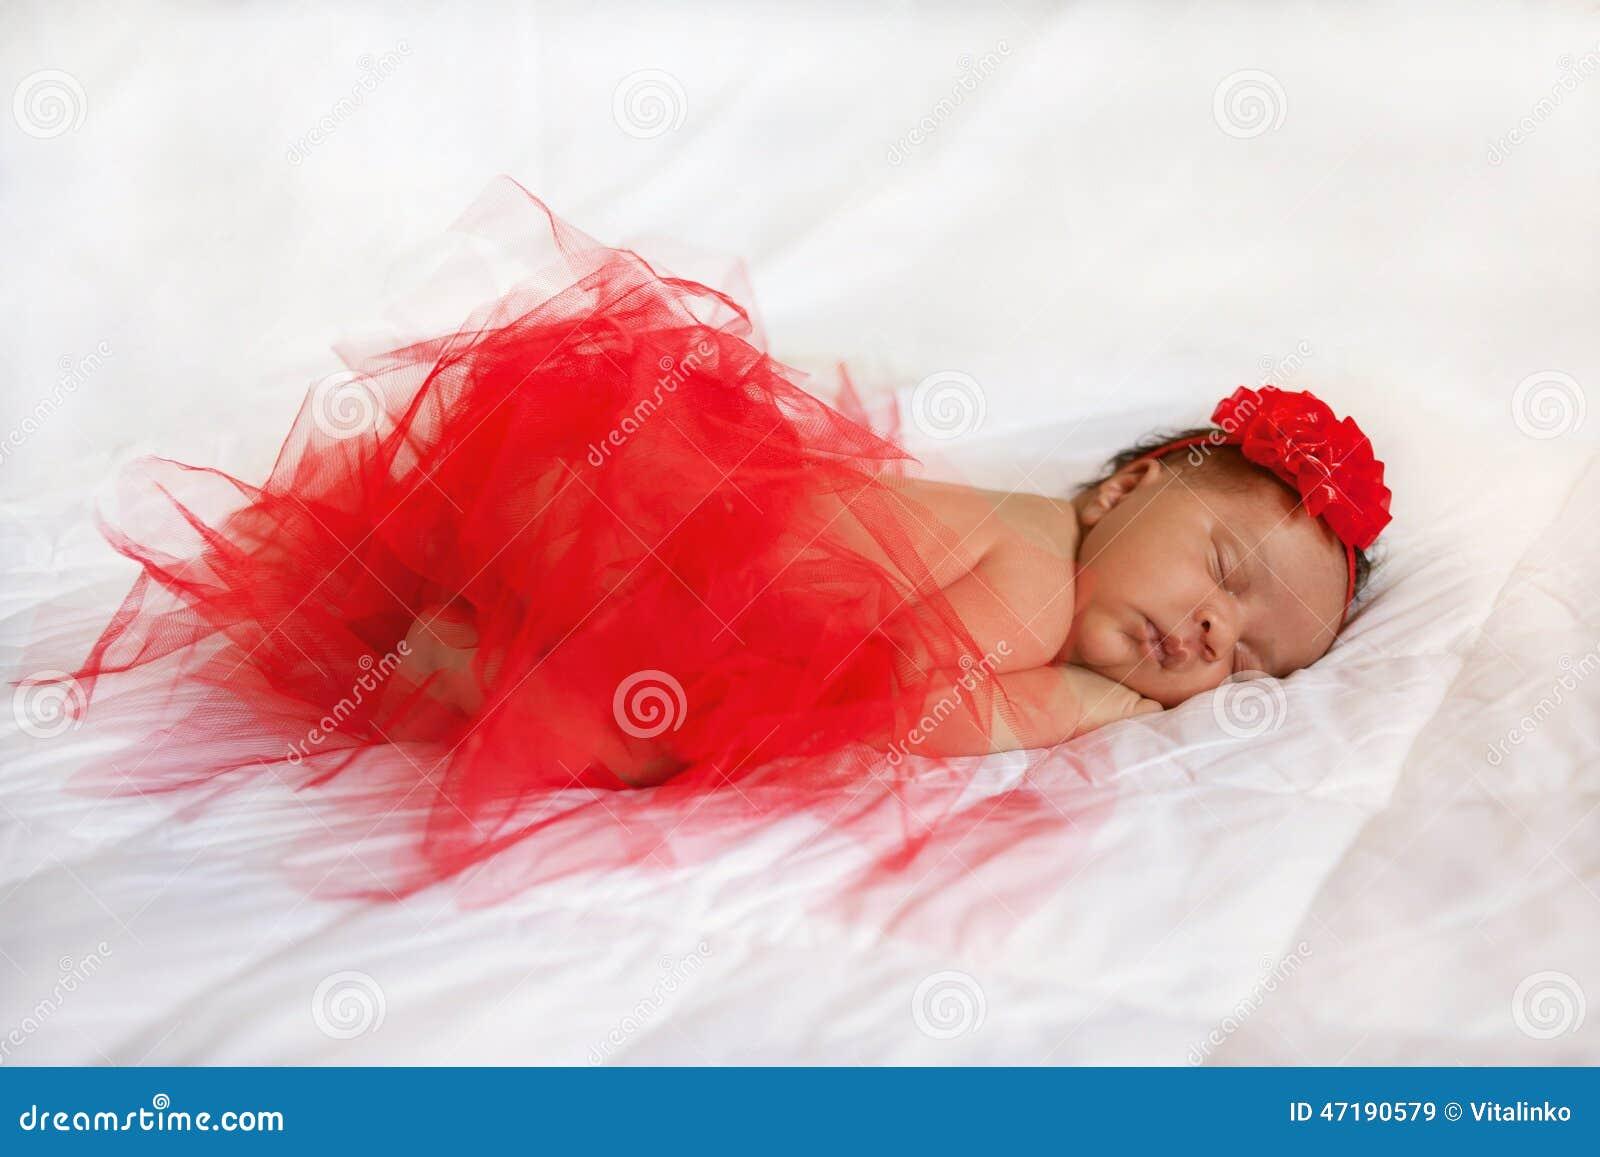 black small newborn baby sleeping royaltyfree stock